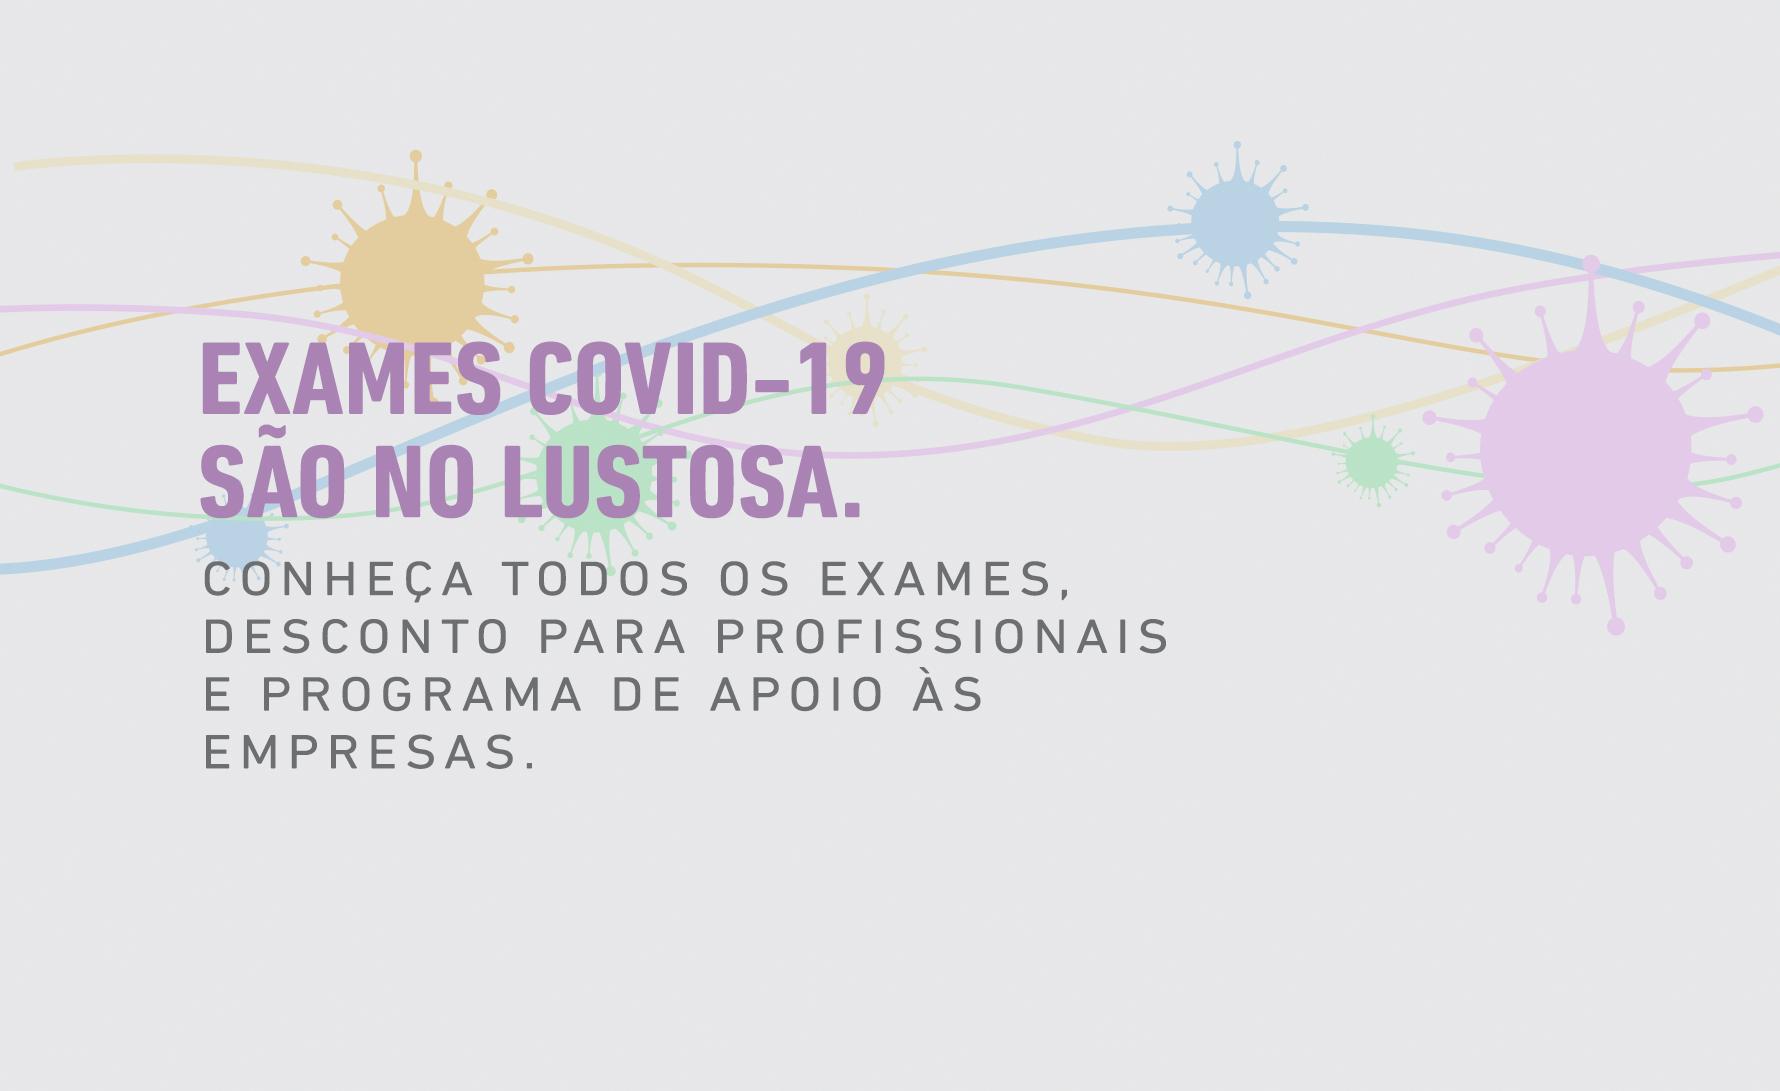 Exames Covid-19 são no Lustosa